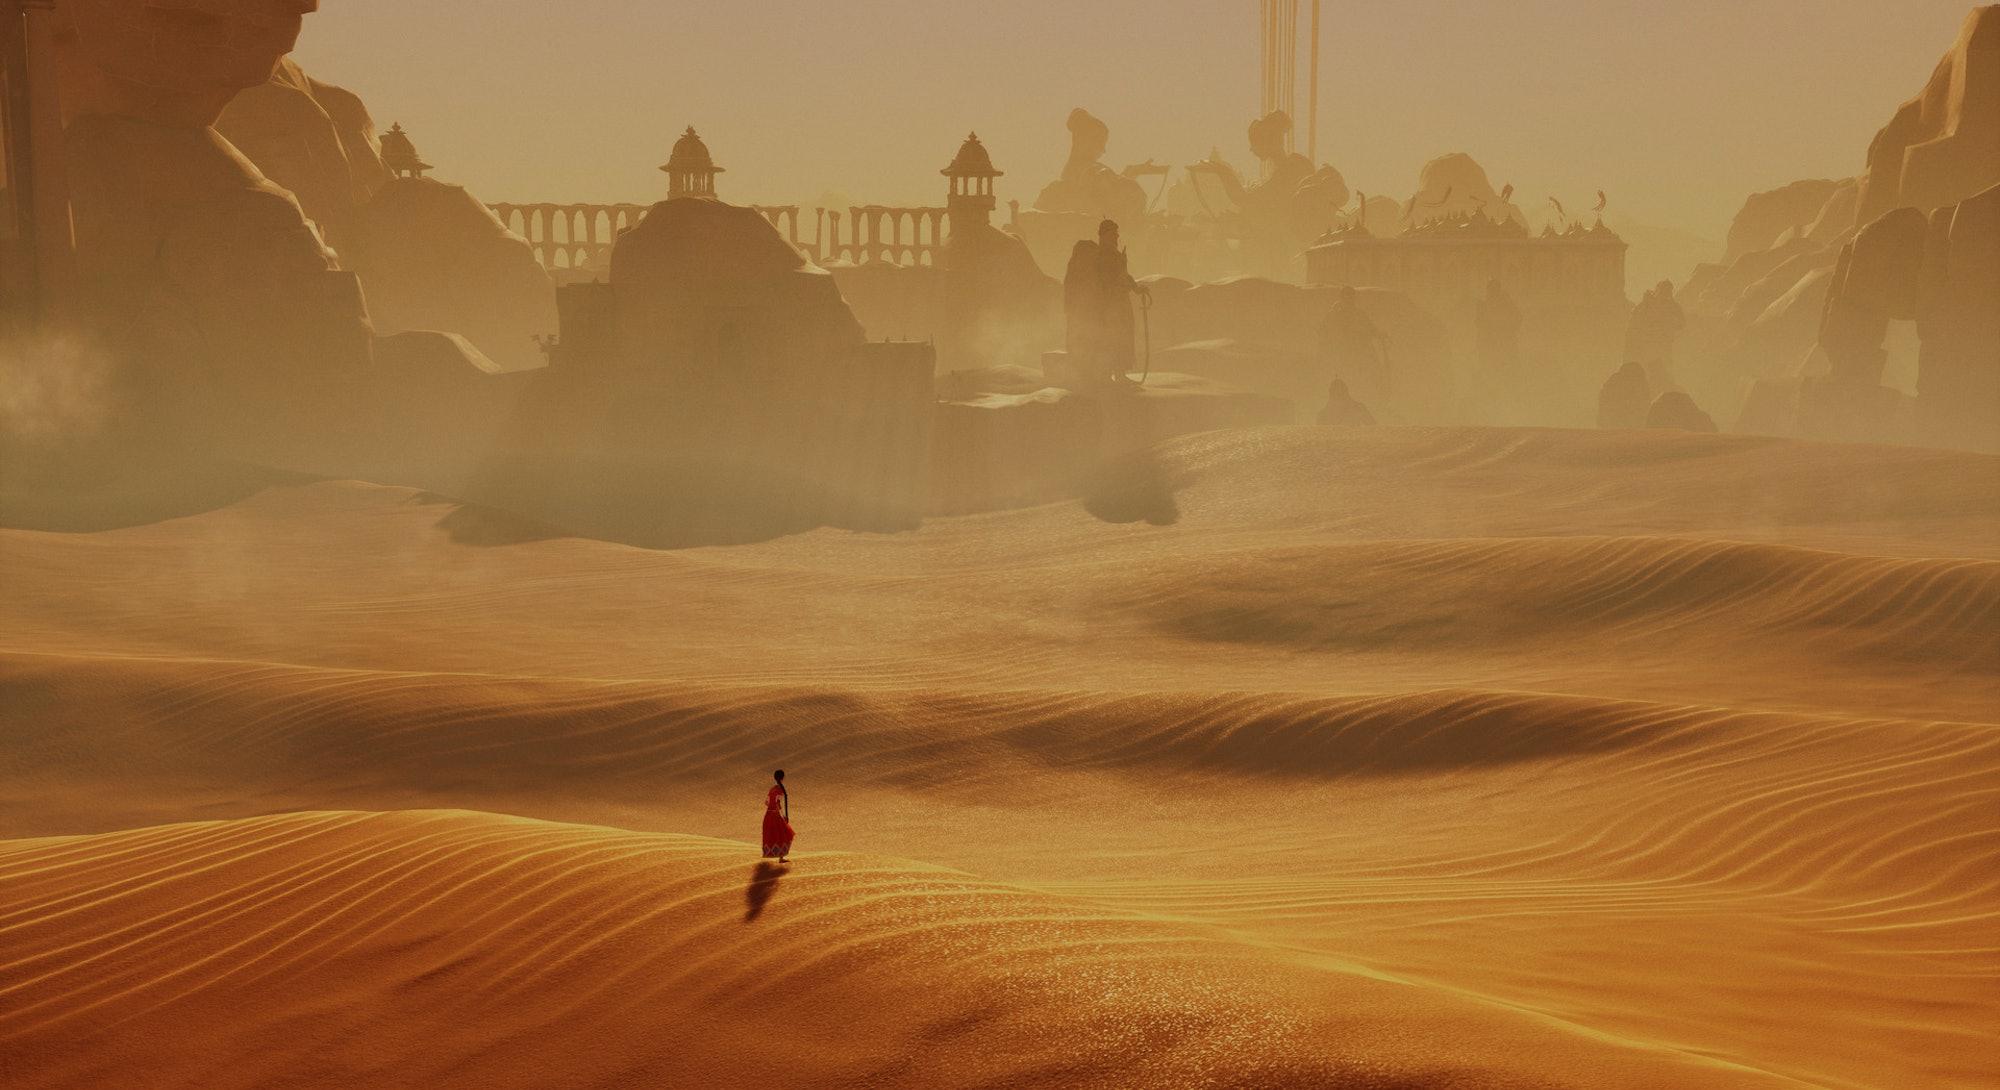 screenshot of desert and ruins from raji an ancient epic